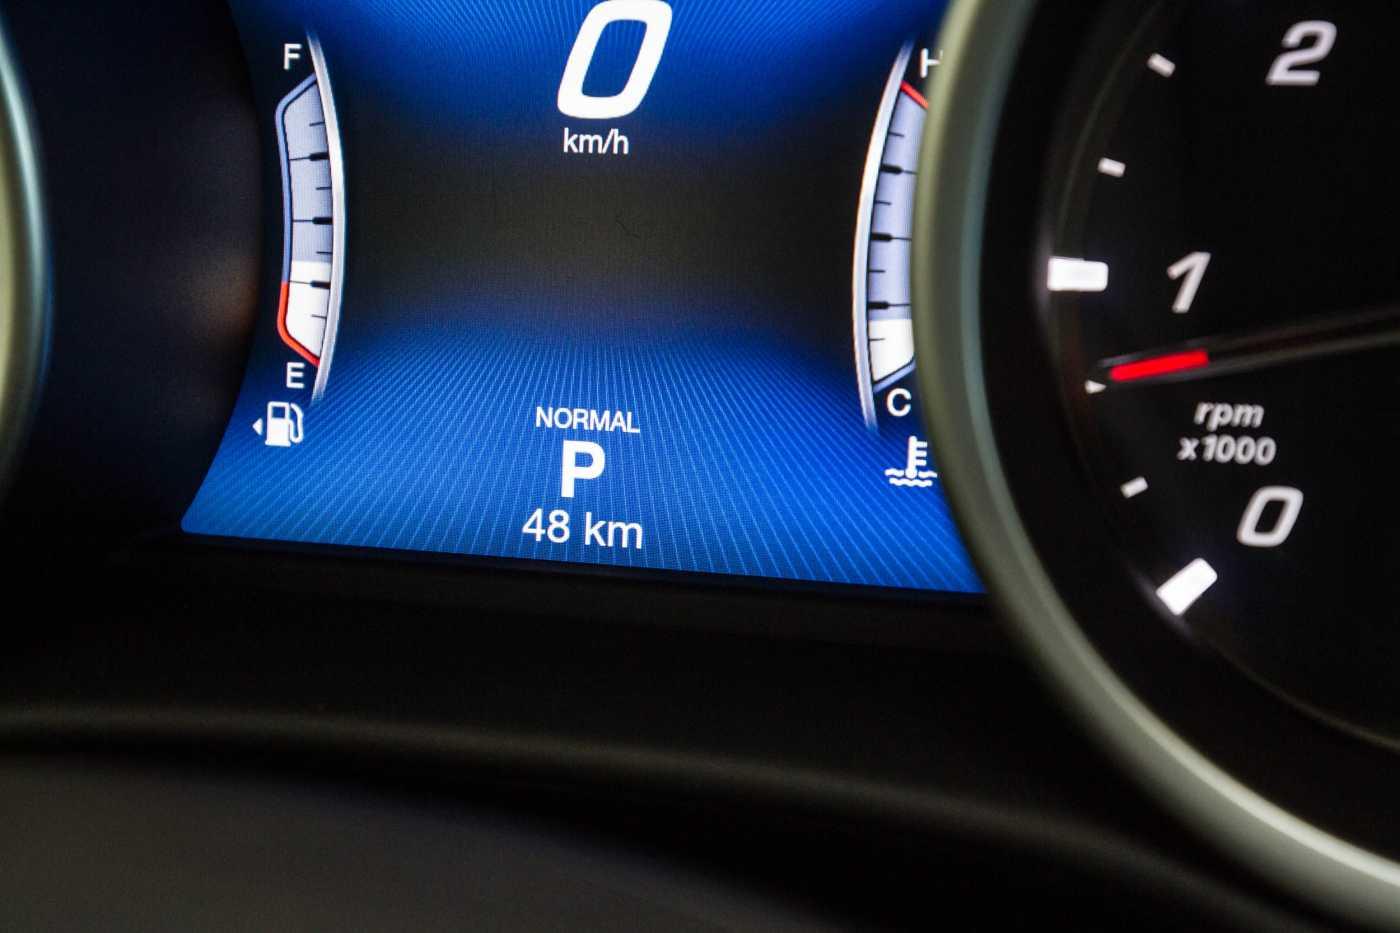 Maserati Ghibli Diesel GranLusso Keyless Sports Exhaust LED Camera 19/29